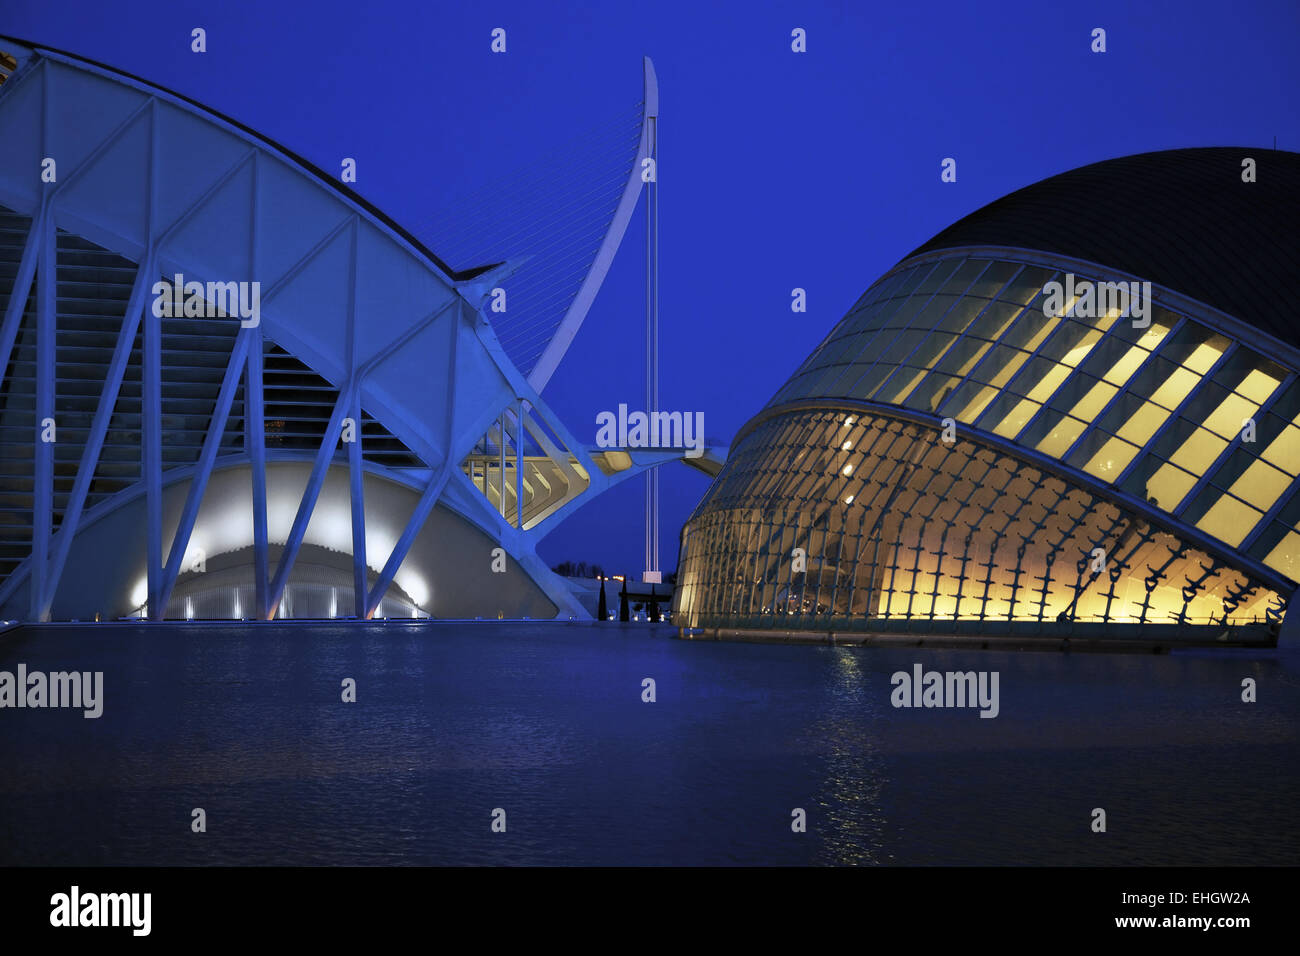 Planetarium and Science Museum Prince Felipe - Stock Image